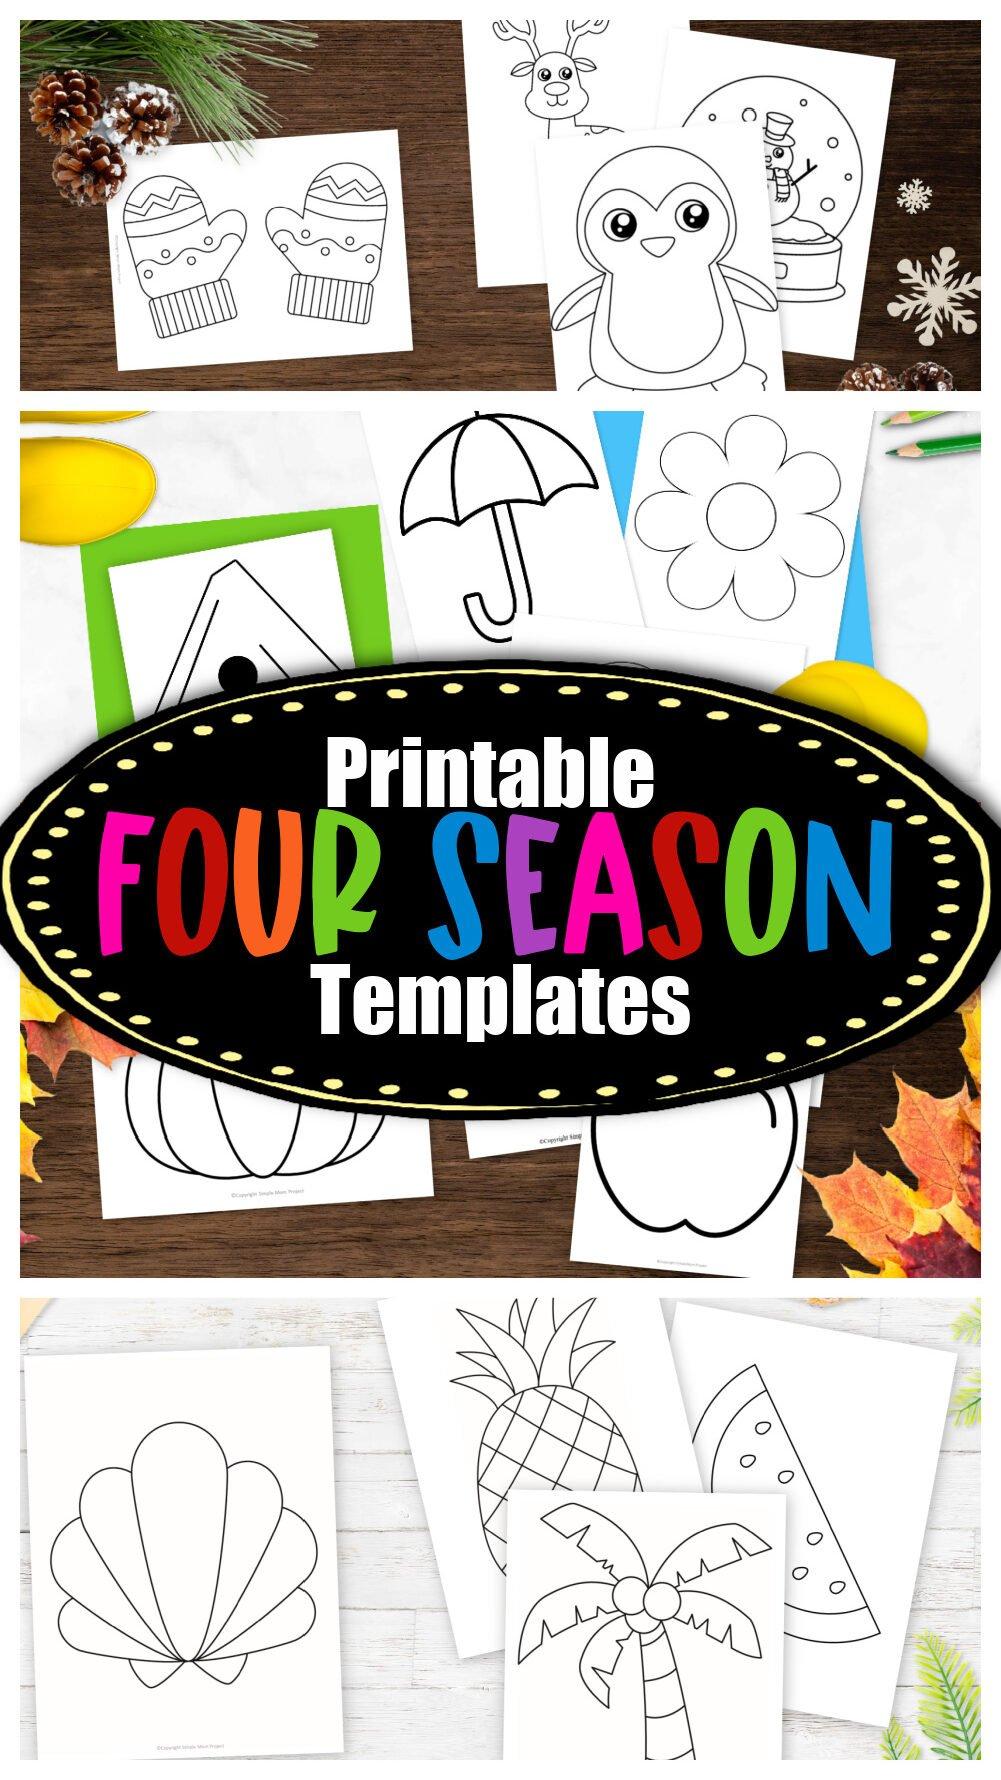 Printable Four Season Templates for Preschoolers, Toddlers and Kindergartners